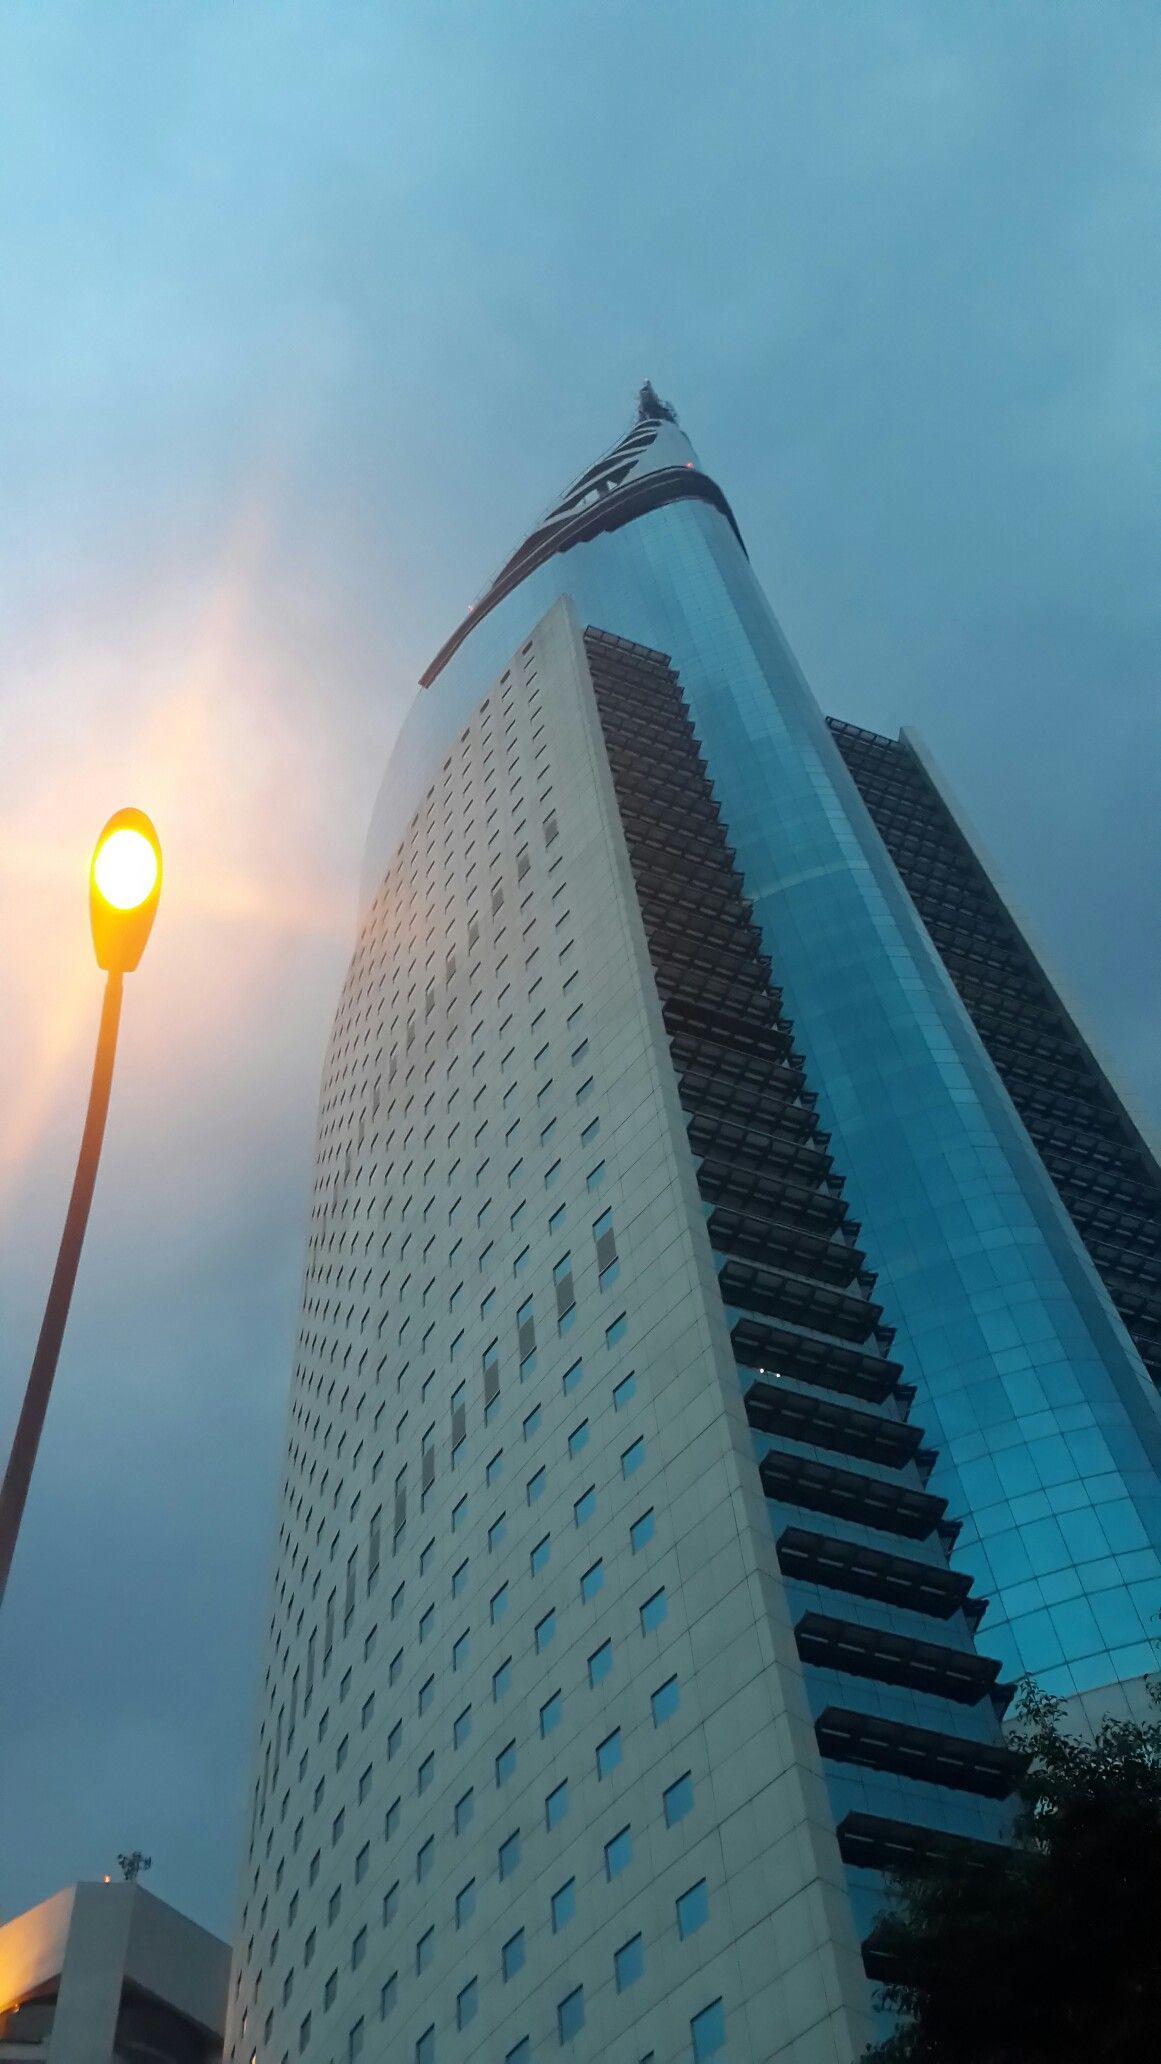 Wisma 46 Kota BNI. Central Jakarta.